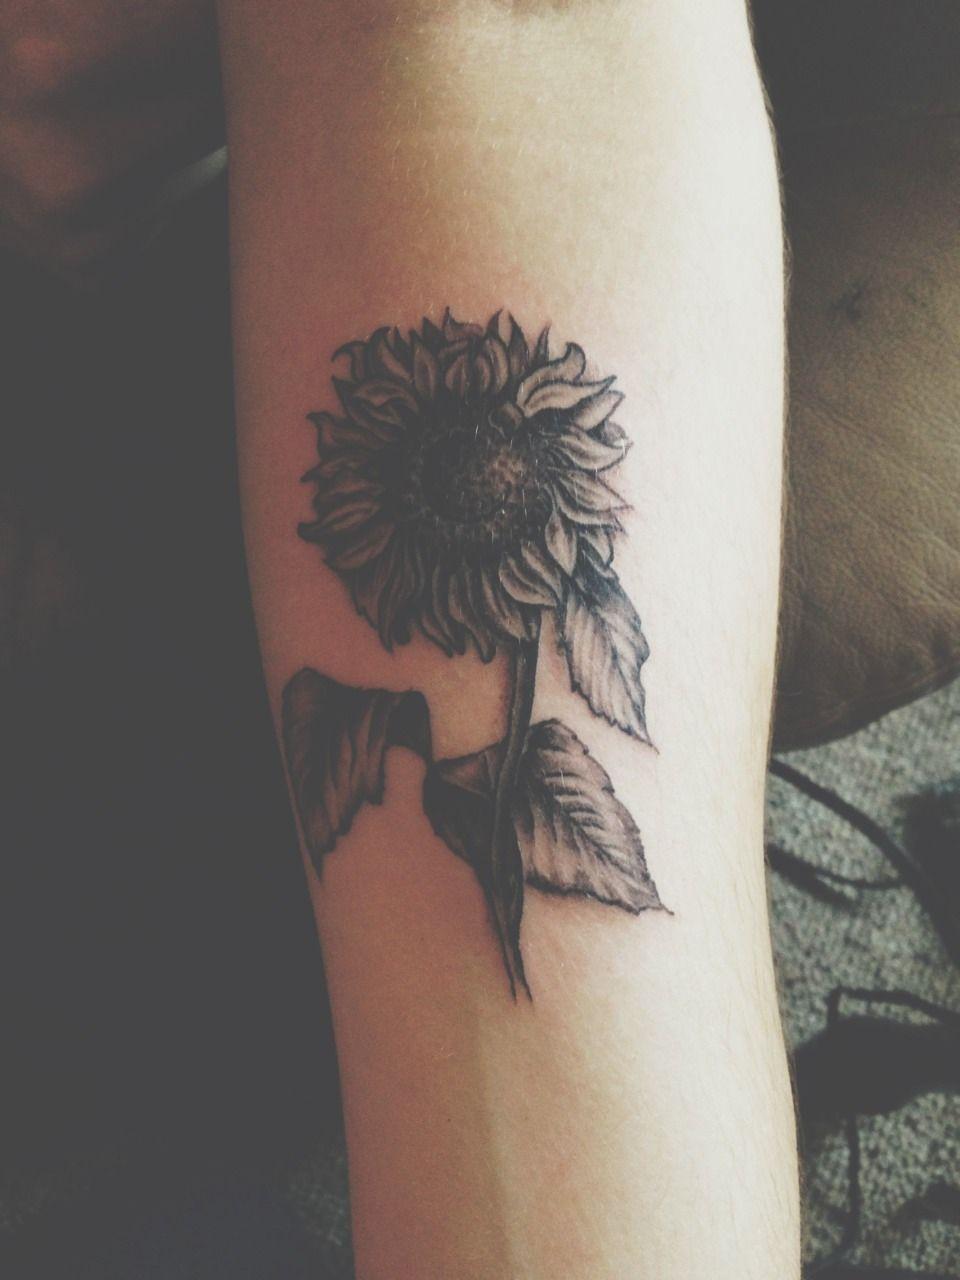 Flower Tattoo Tattoos Pinterest Flower Tattoos Spiritual And